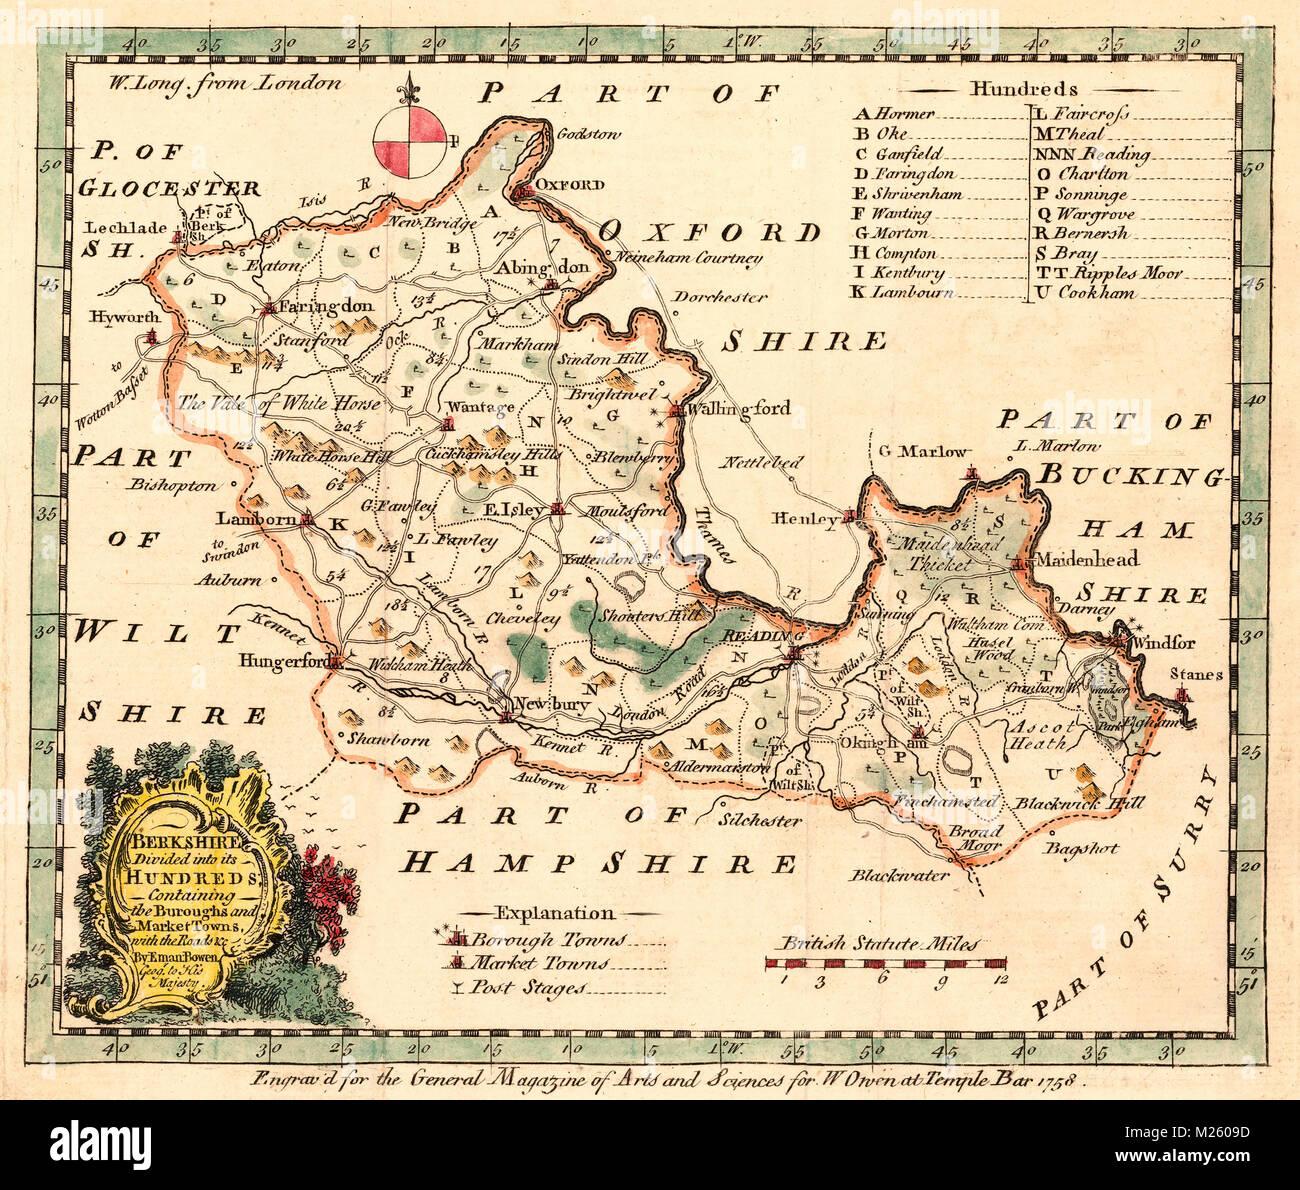 Historical Map Of Berkshire England Circa 1758 Stock Photo